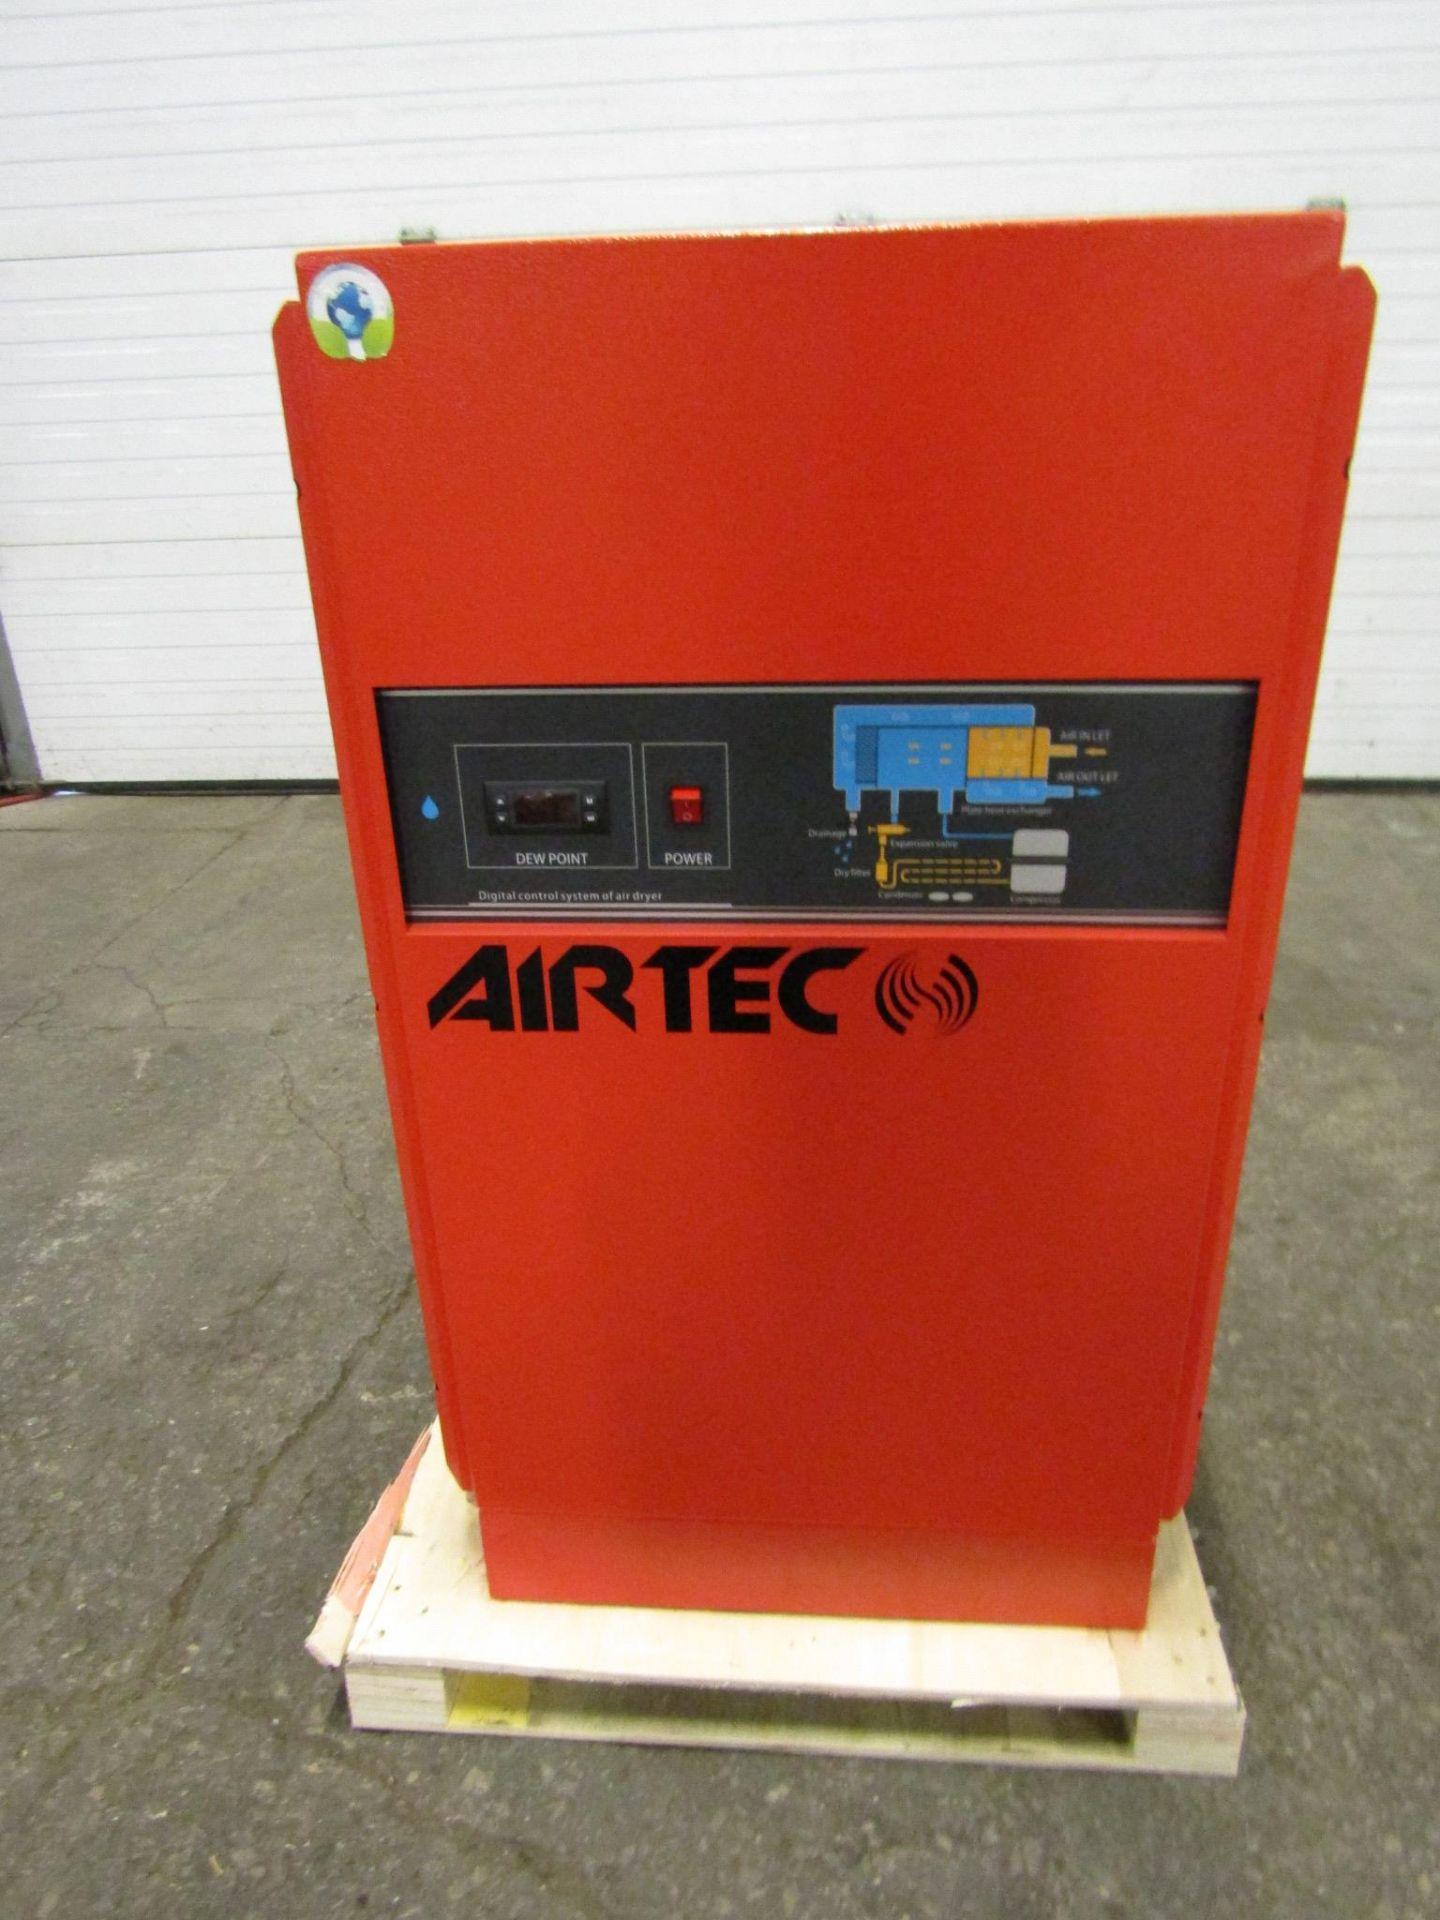 MINT Airtec Compressed Air Dryer 371 CFM - 75HP Unused new unit